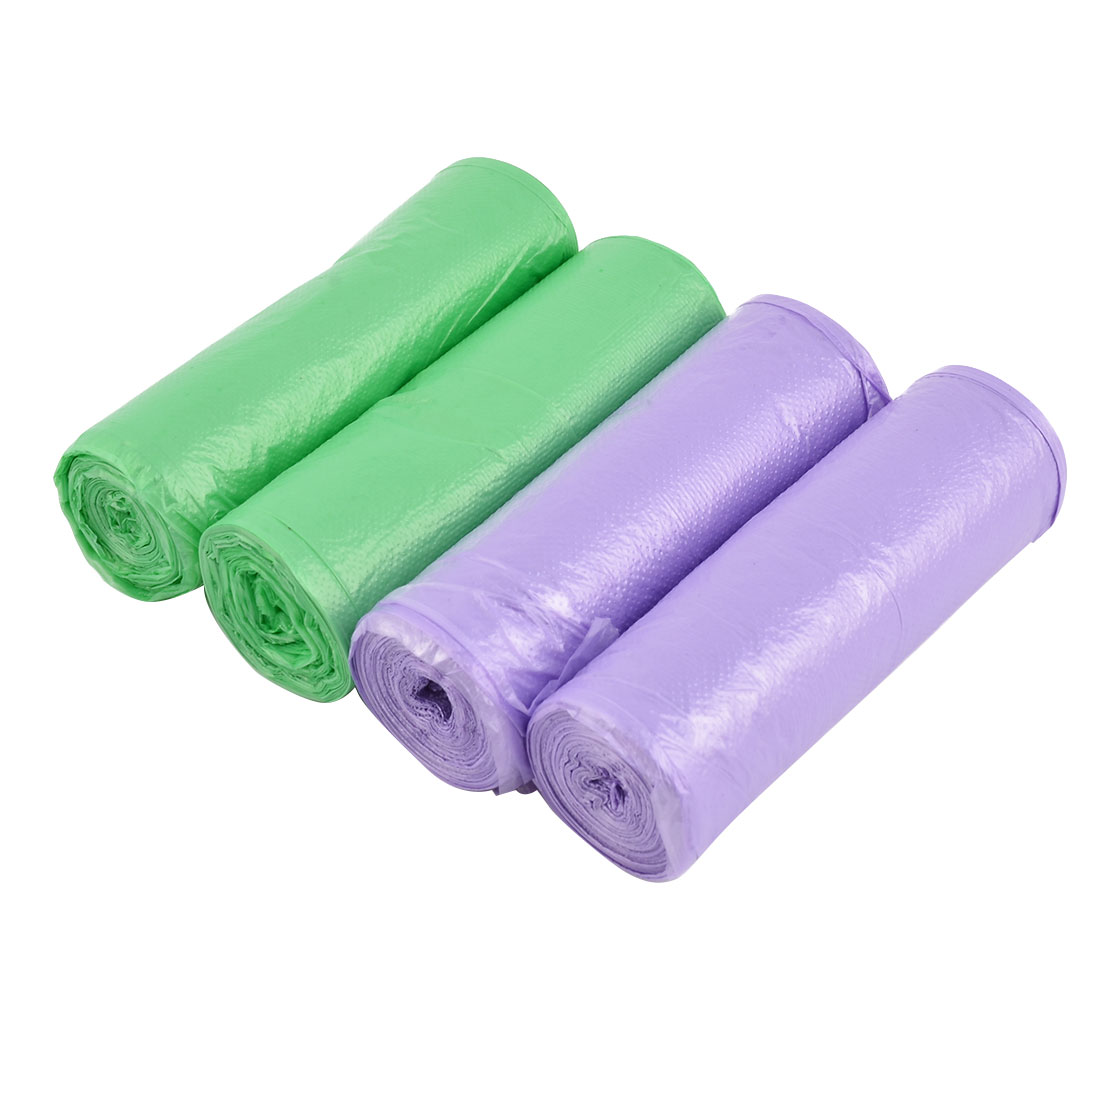 Home Bathroom Polyethylene Garbage Waste Rubbish Storage Container Bag Roll 4 Rolls